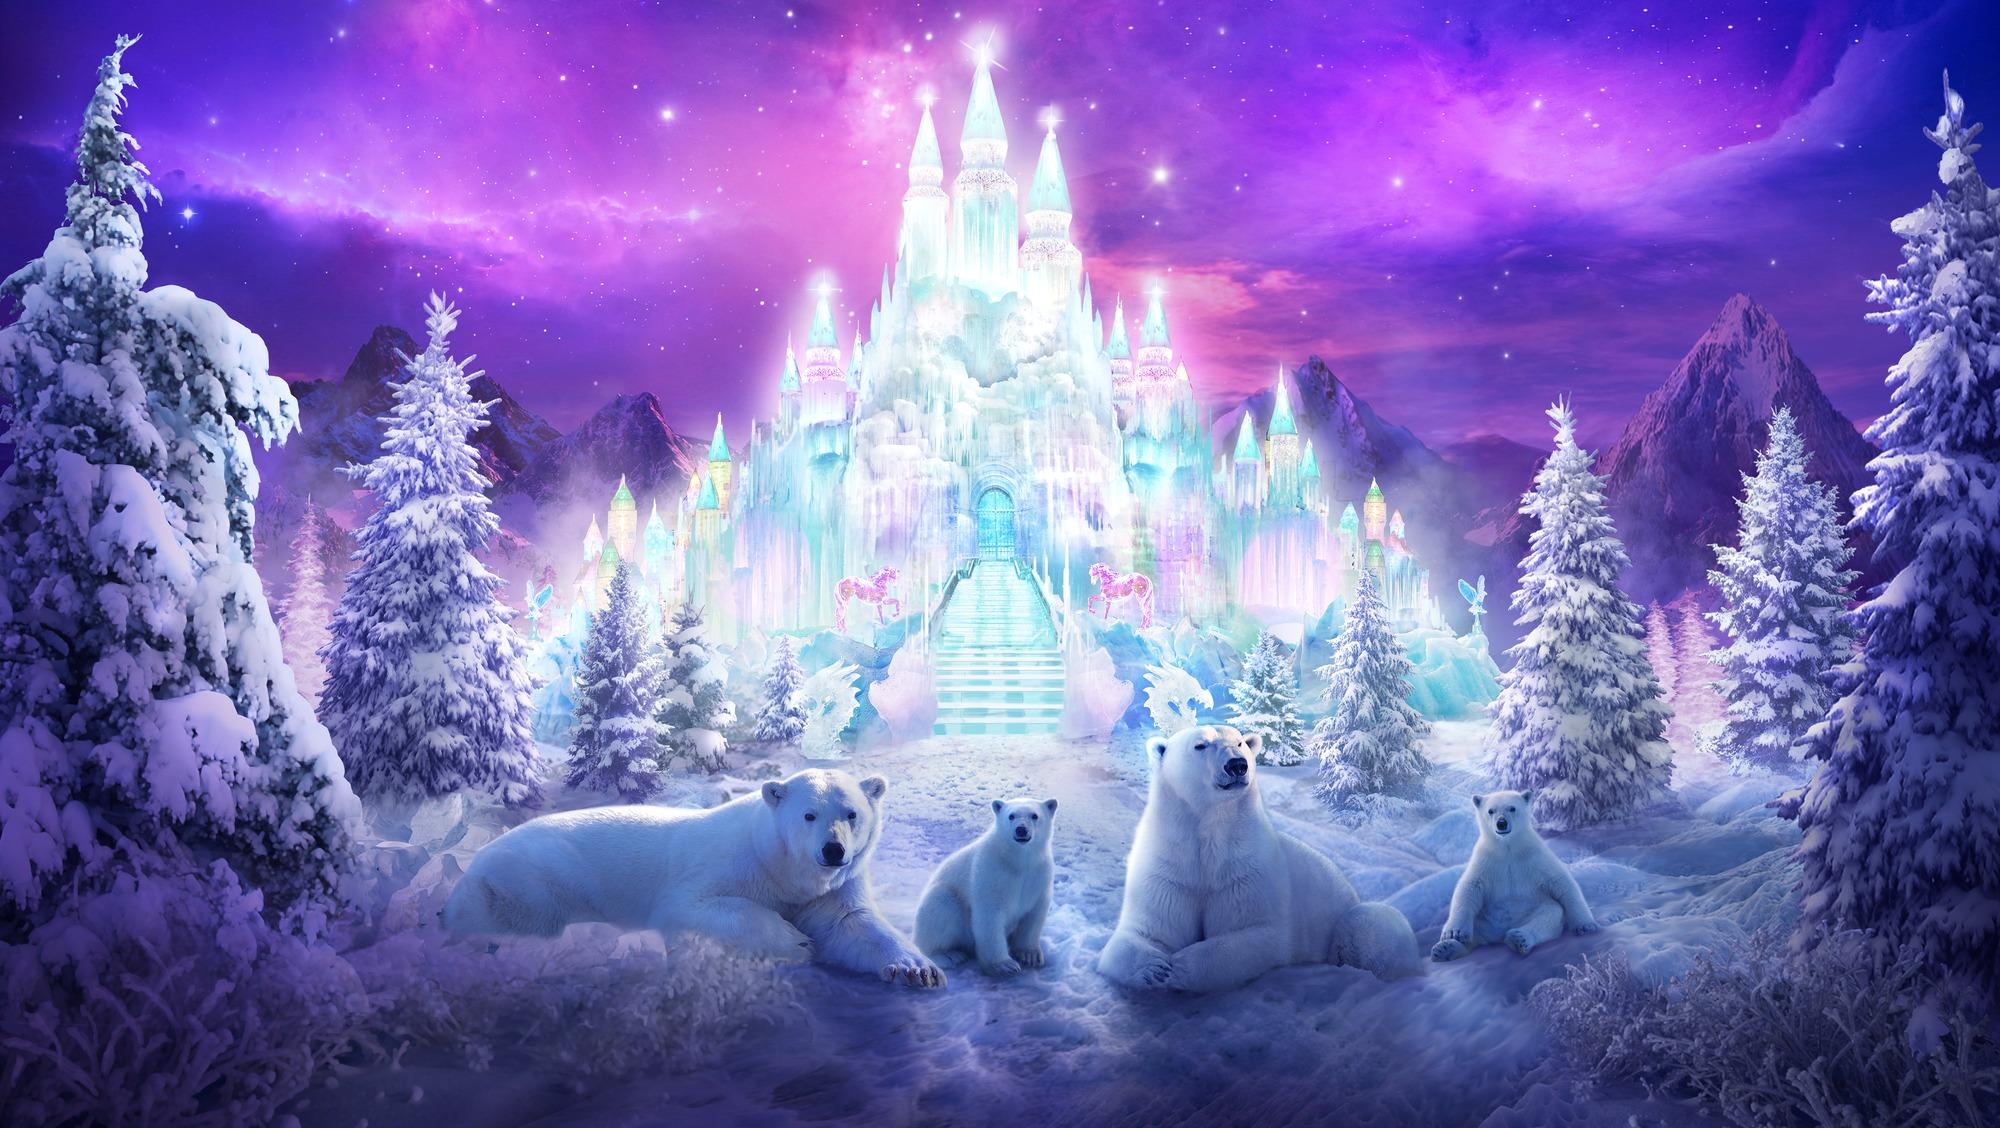 A Winter Wonderland Wall Mural By Philip Straub Wallsauce